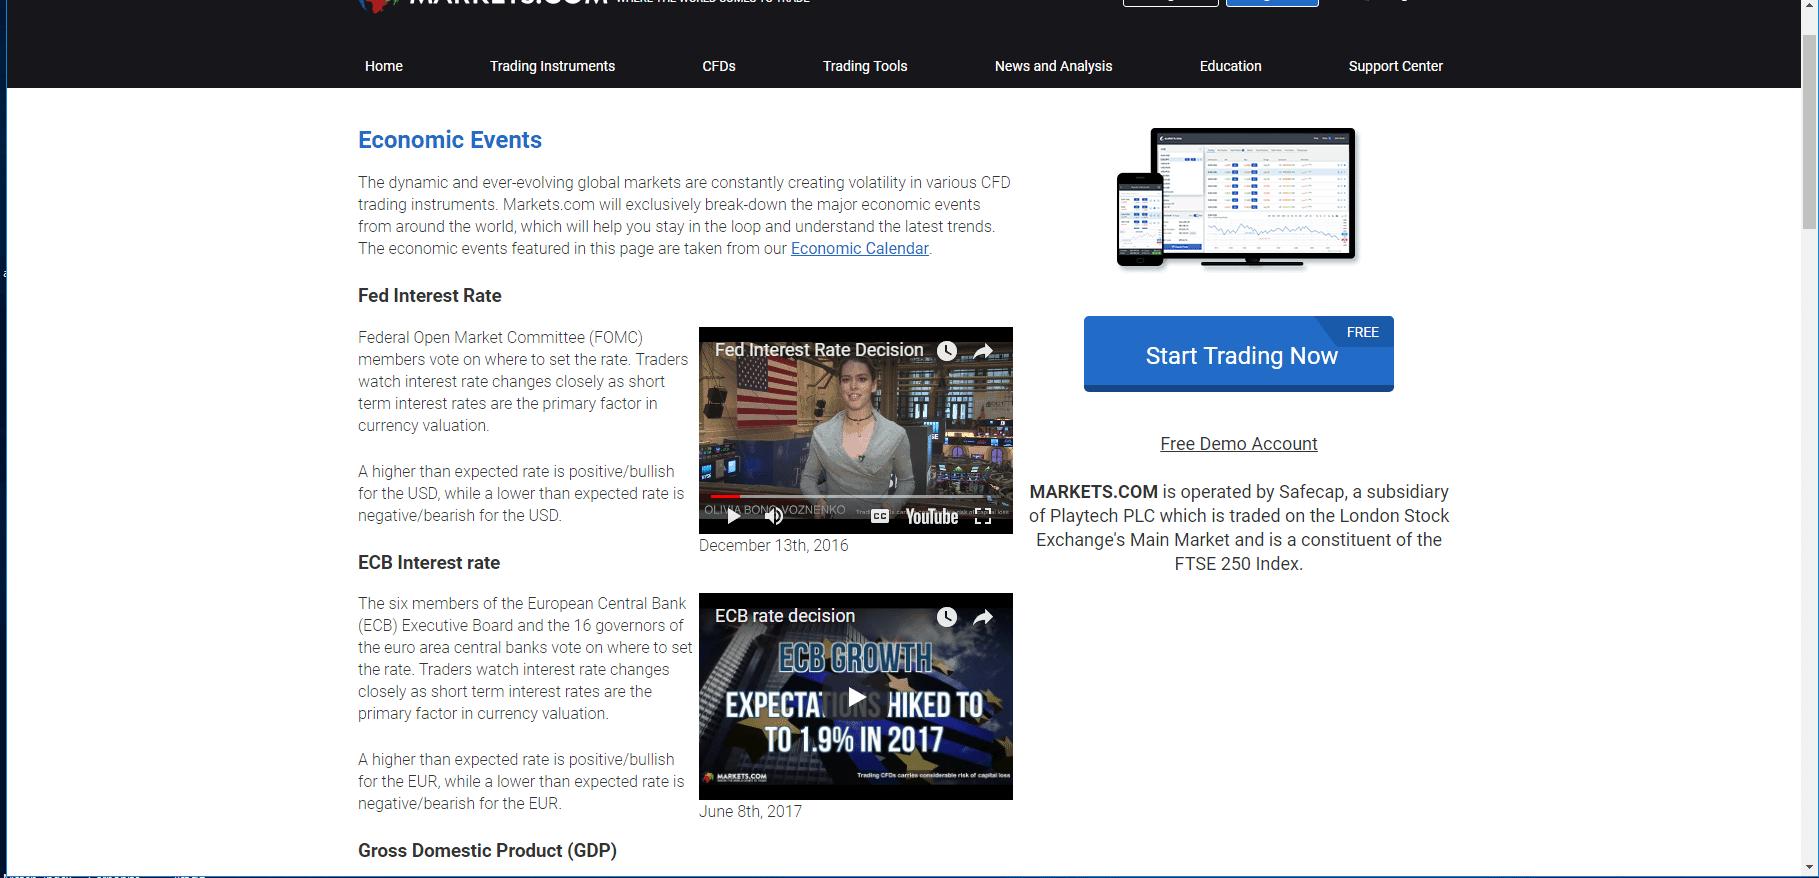 markets.com educational resources screenshot